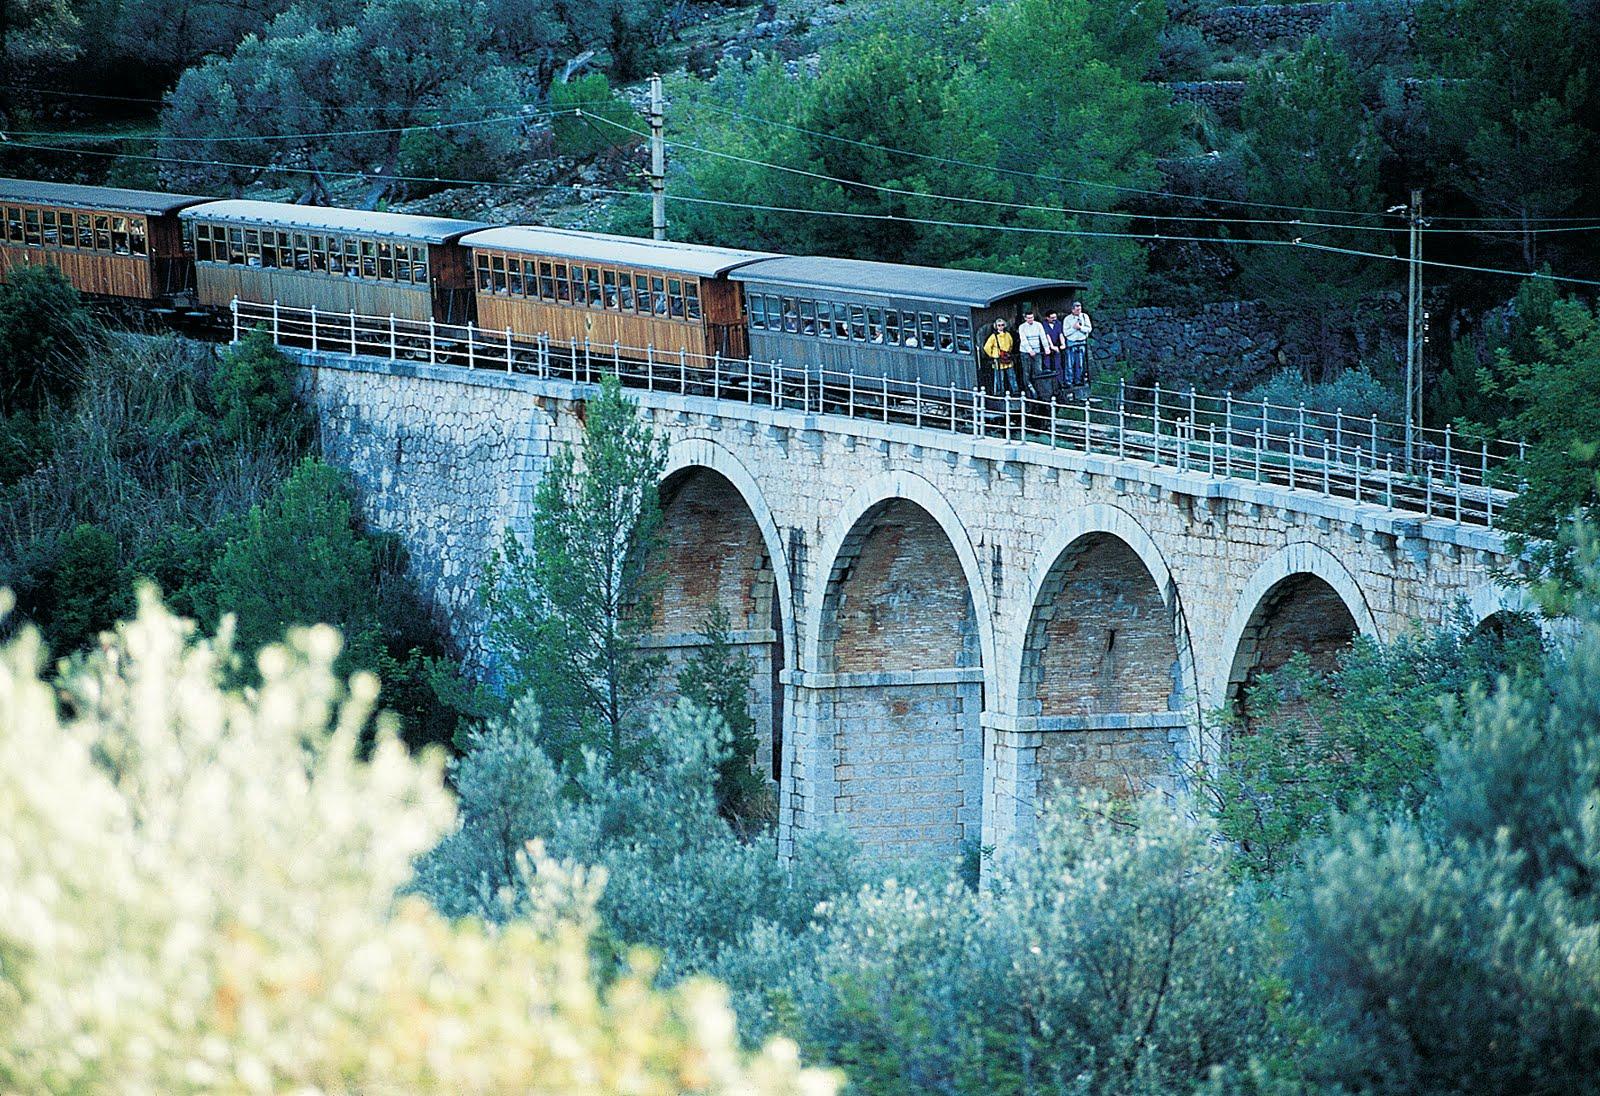 http://2.bp.blogspot.com/-L4NkphUOcg4/Tj18Xlk4dPI/AAAAAAAAAE8/KCwWv7rx4pc/s1600/Palma+Soller+train.jpg